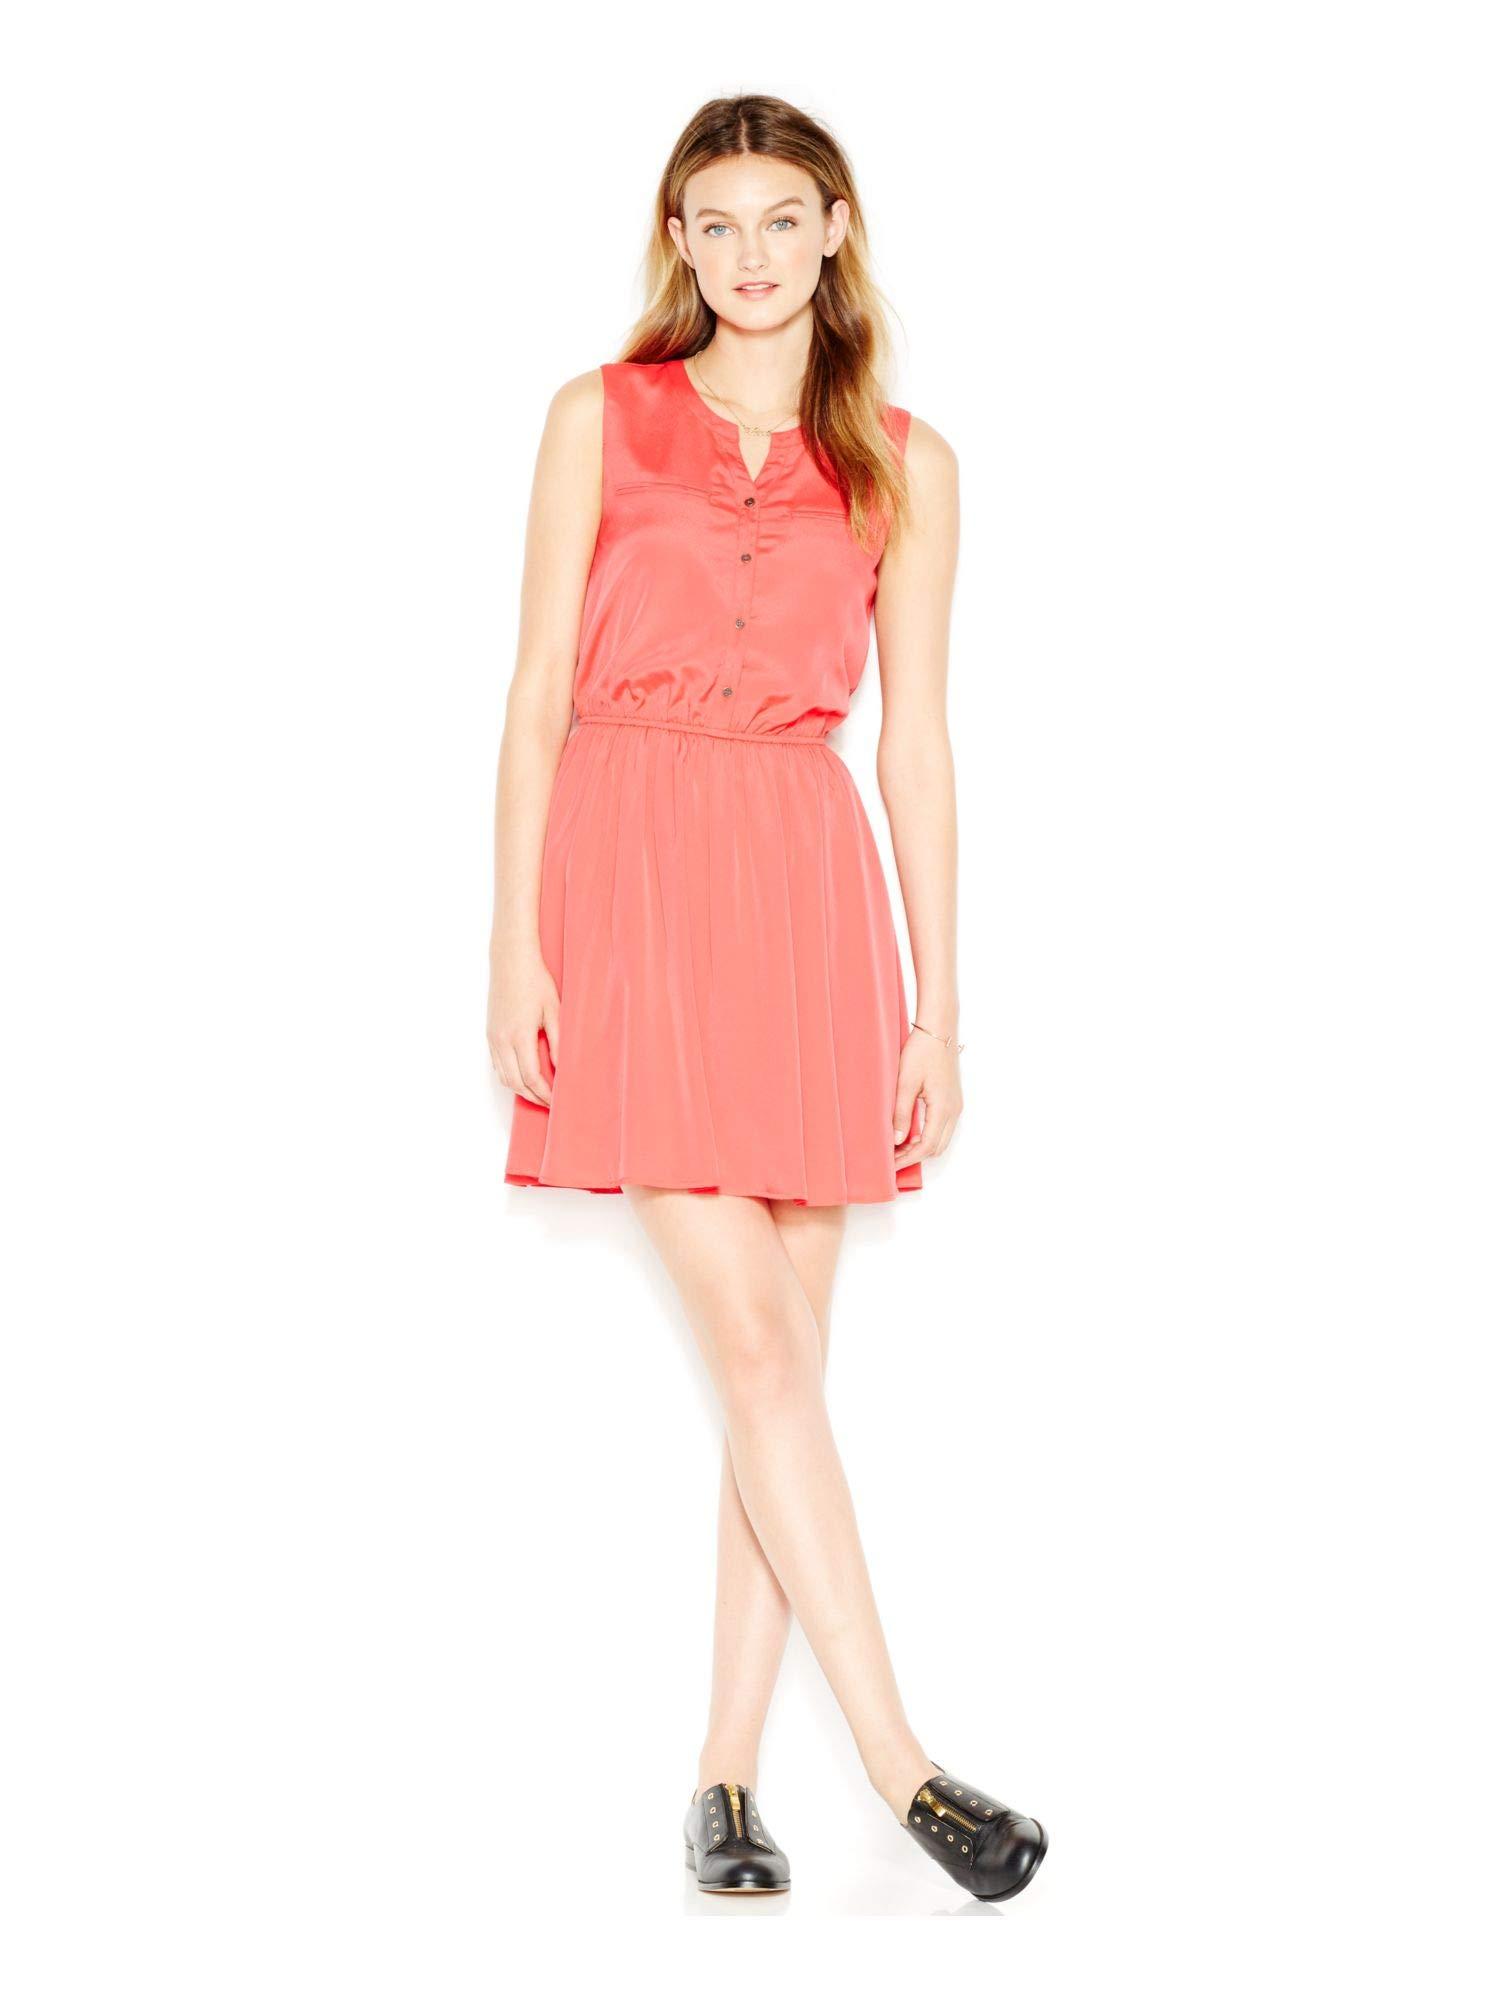 Available at Amazon: Maison Jules Women's Sleeveless Blouson Casual Dress Orange L